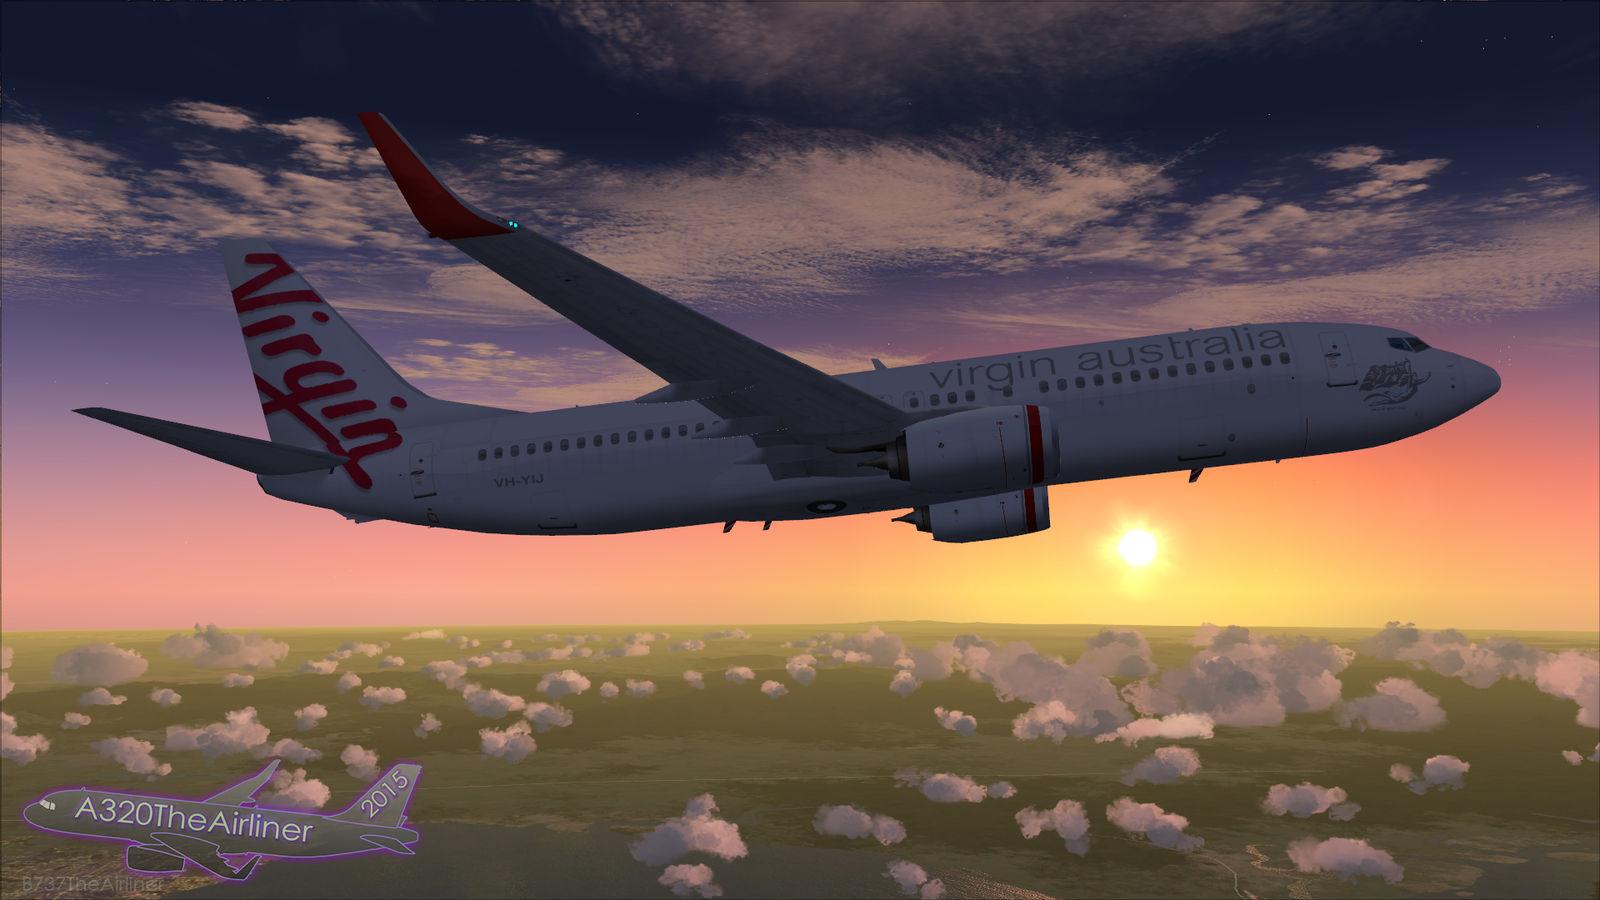 Virgin Australia 737-800 - Sunset Flight - FSX by